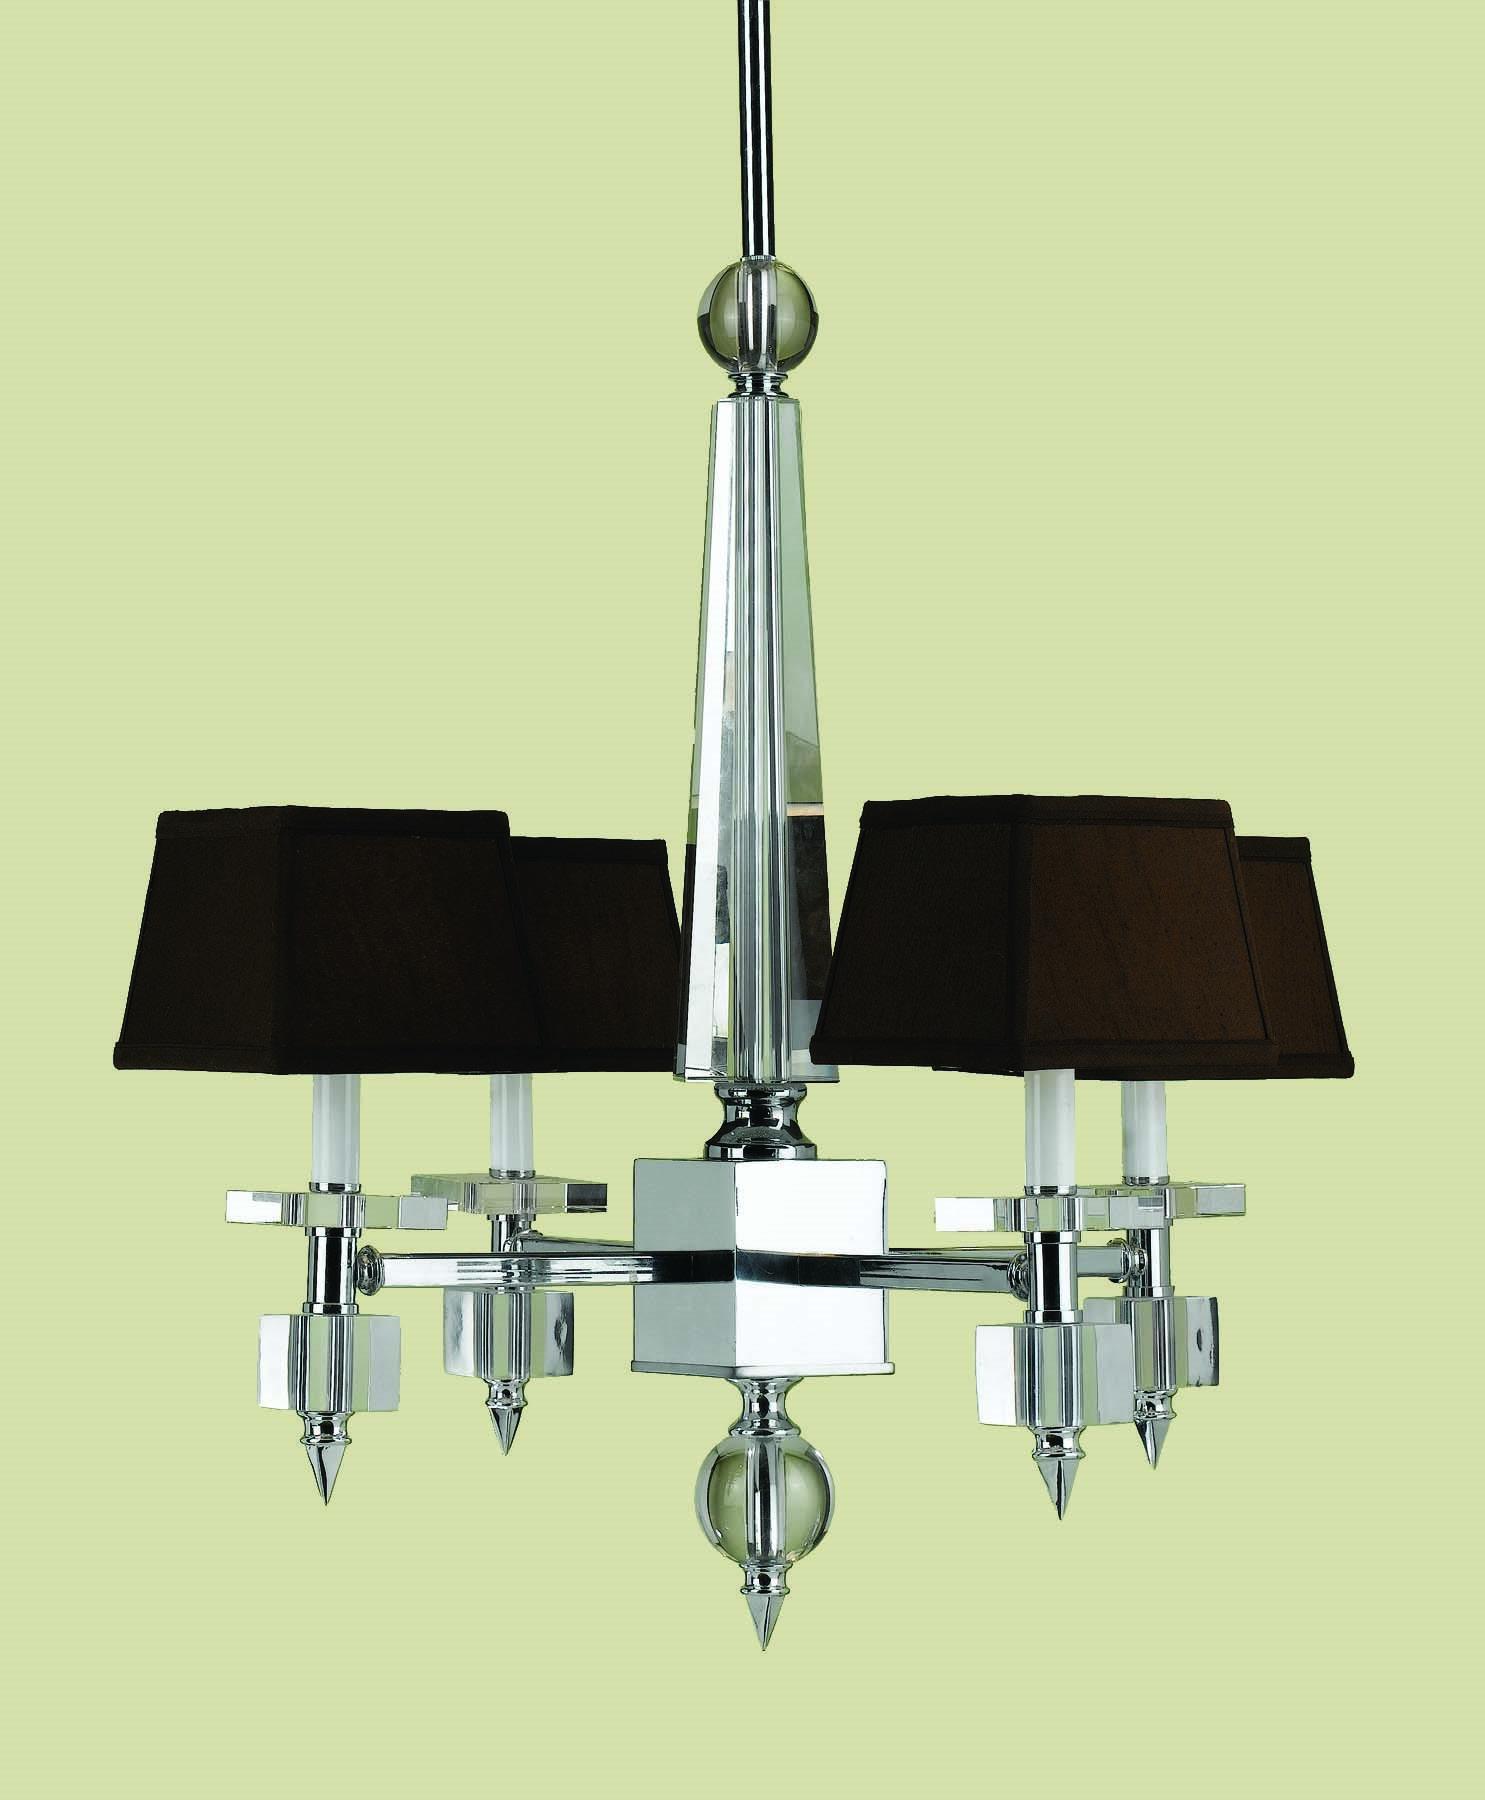 Af Lighting 6686 4h Cluny Modern Contemporary Chandelier